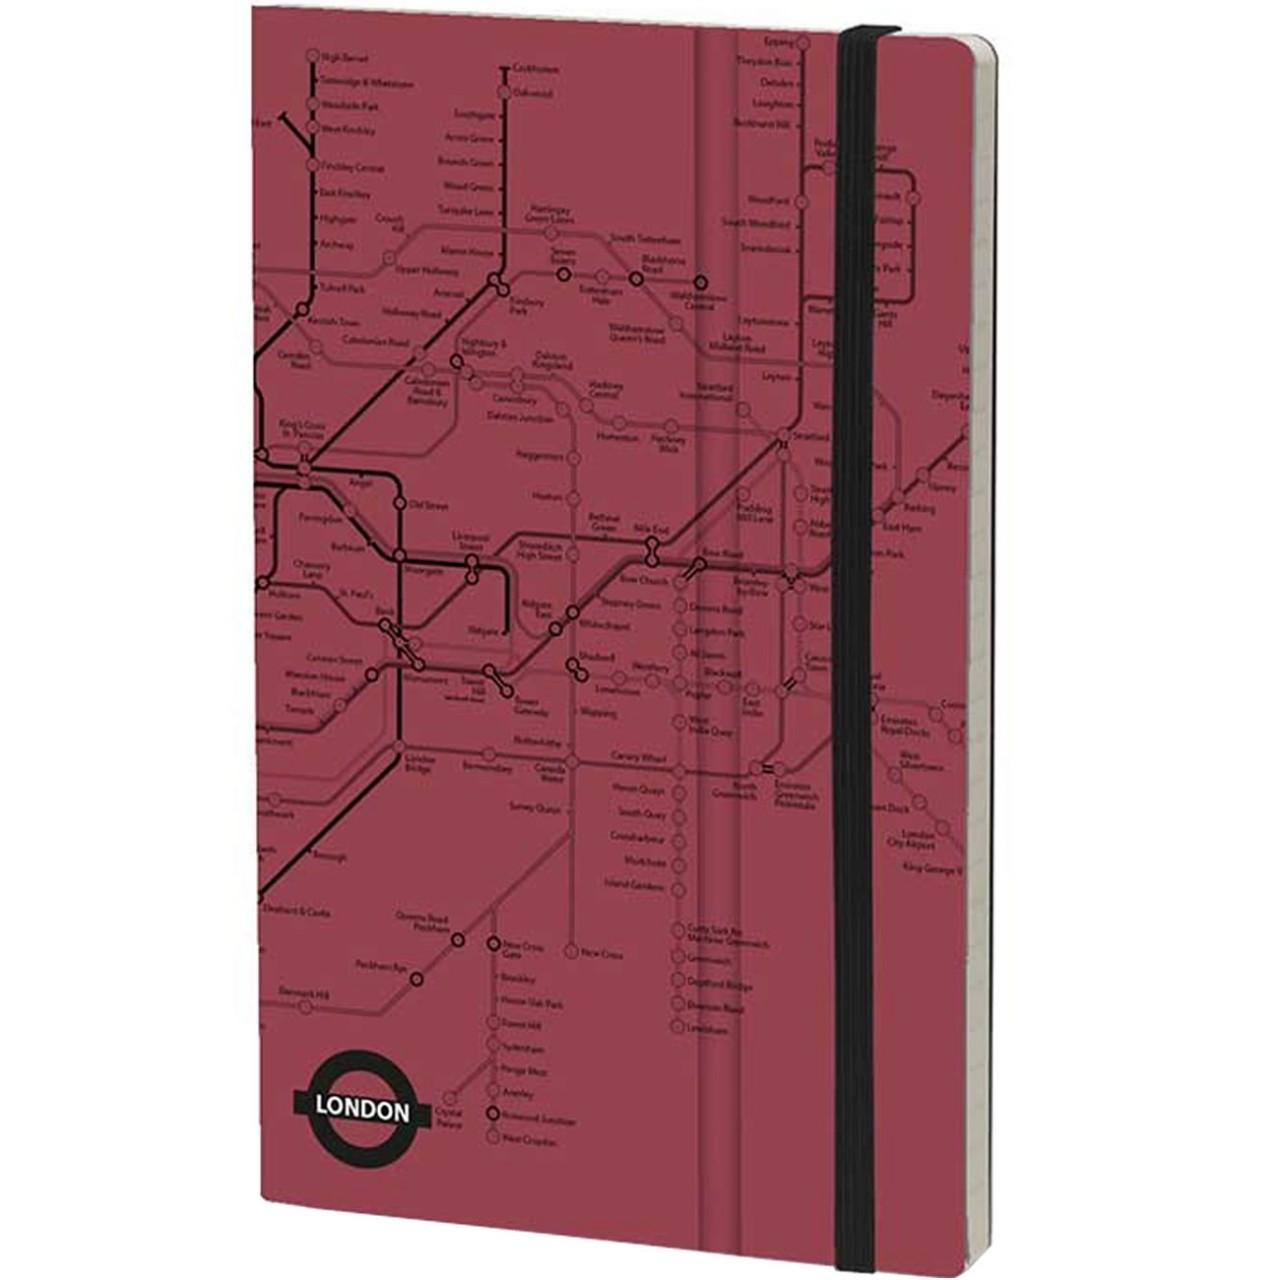 Stifflexible Notizbuch UNDERGROUND 19 x 25 cm 192 S., RED (Londres)